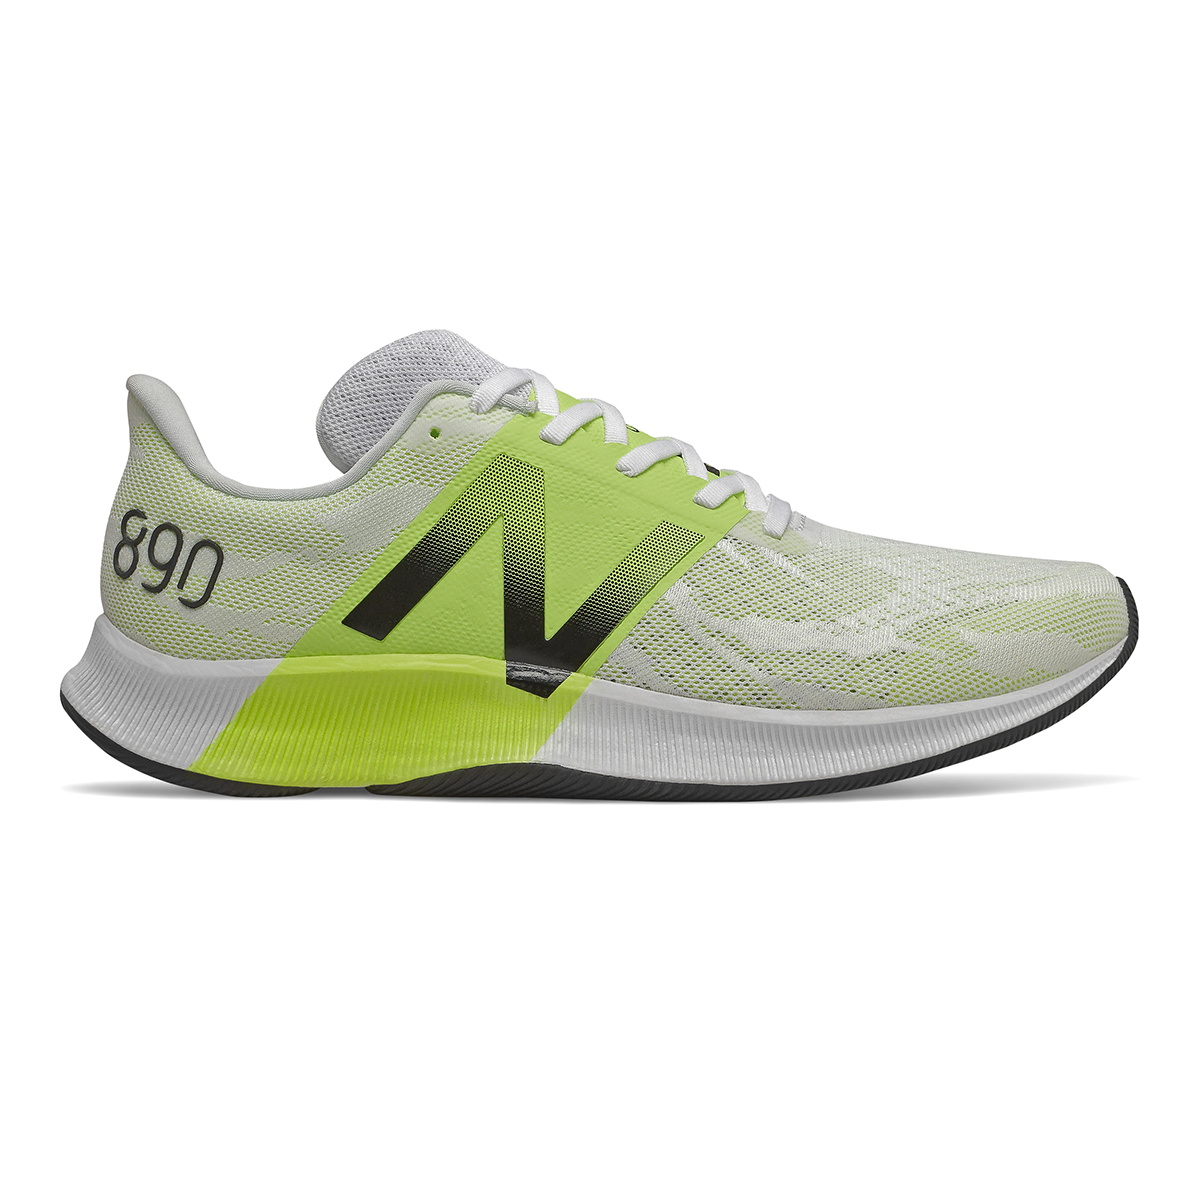 Men's New Balance 890V8 Running Shoe - Color: White (Wide Width) - Size: 7, White, large, image 1